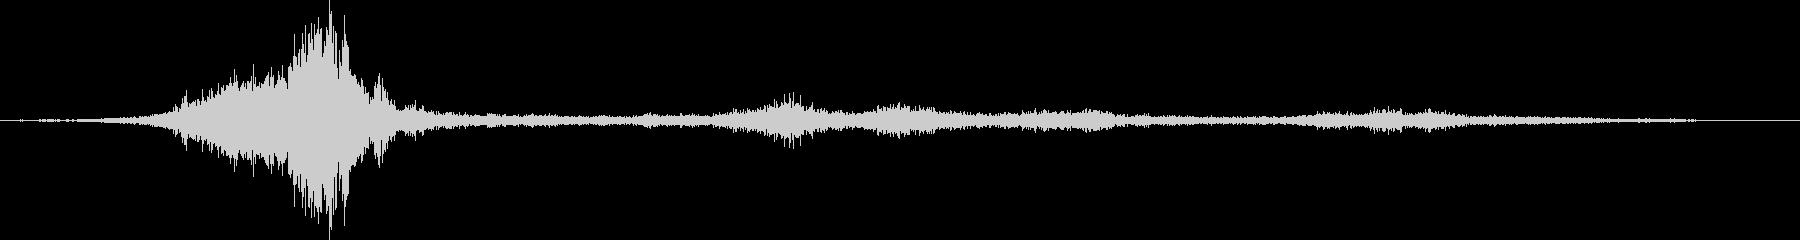 F-5:シリーズ3で:高;フォーメ...の未再生の波形